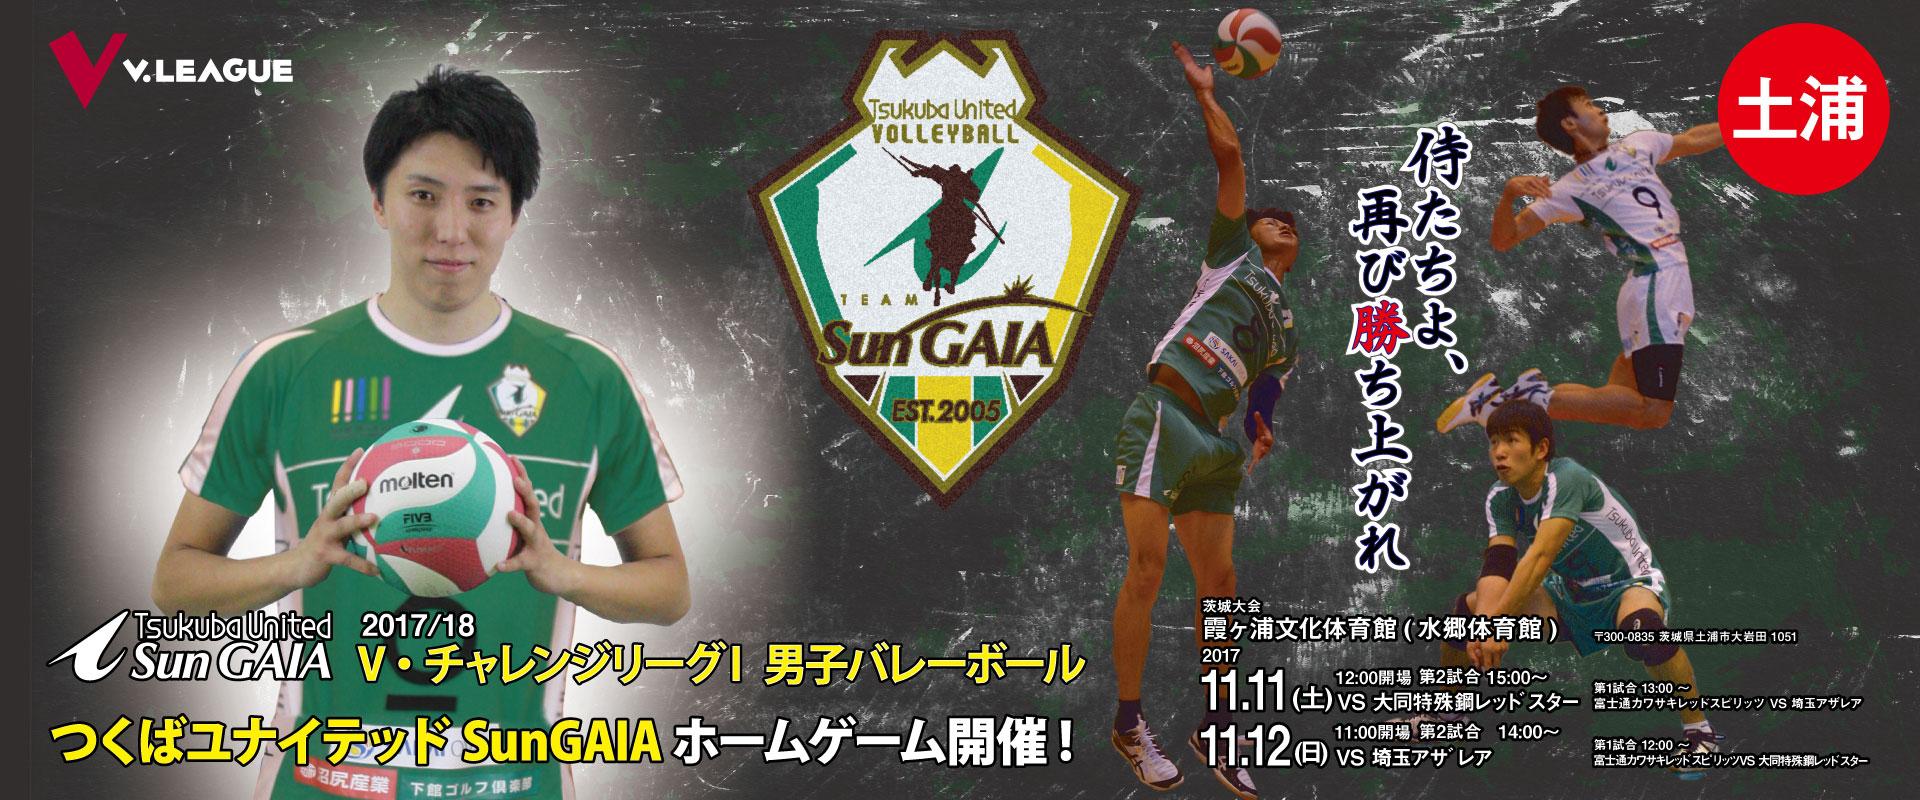 2017/18 V・チャレンジリーグⅠ 男子バレーボール 土浦大会